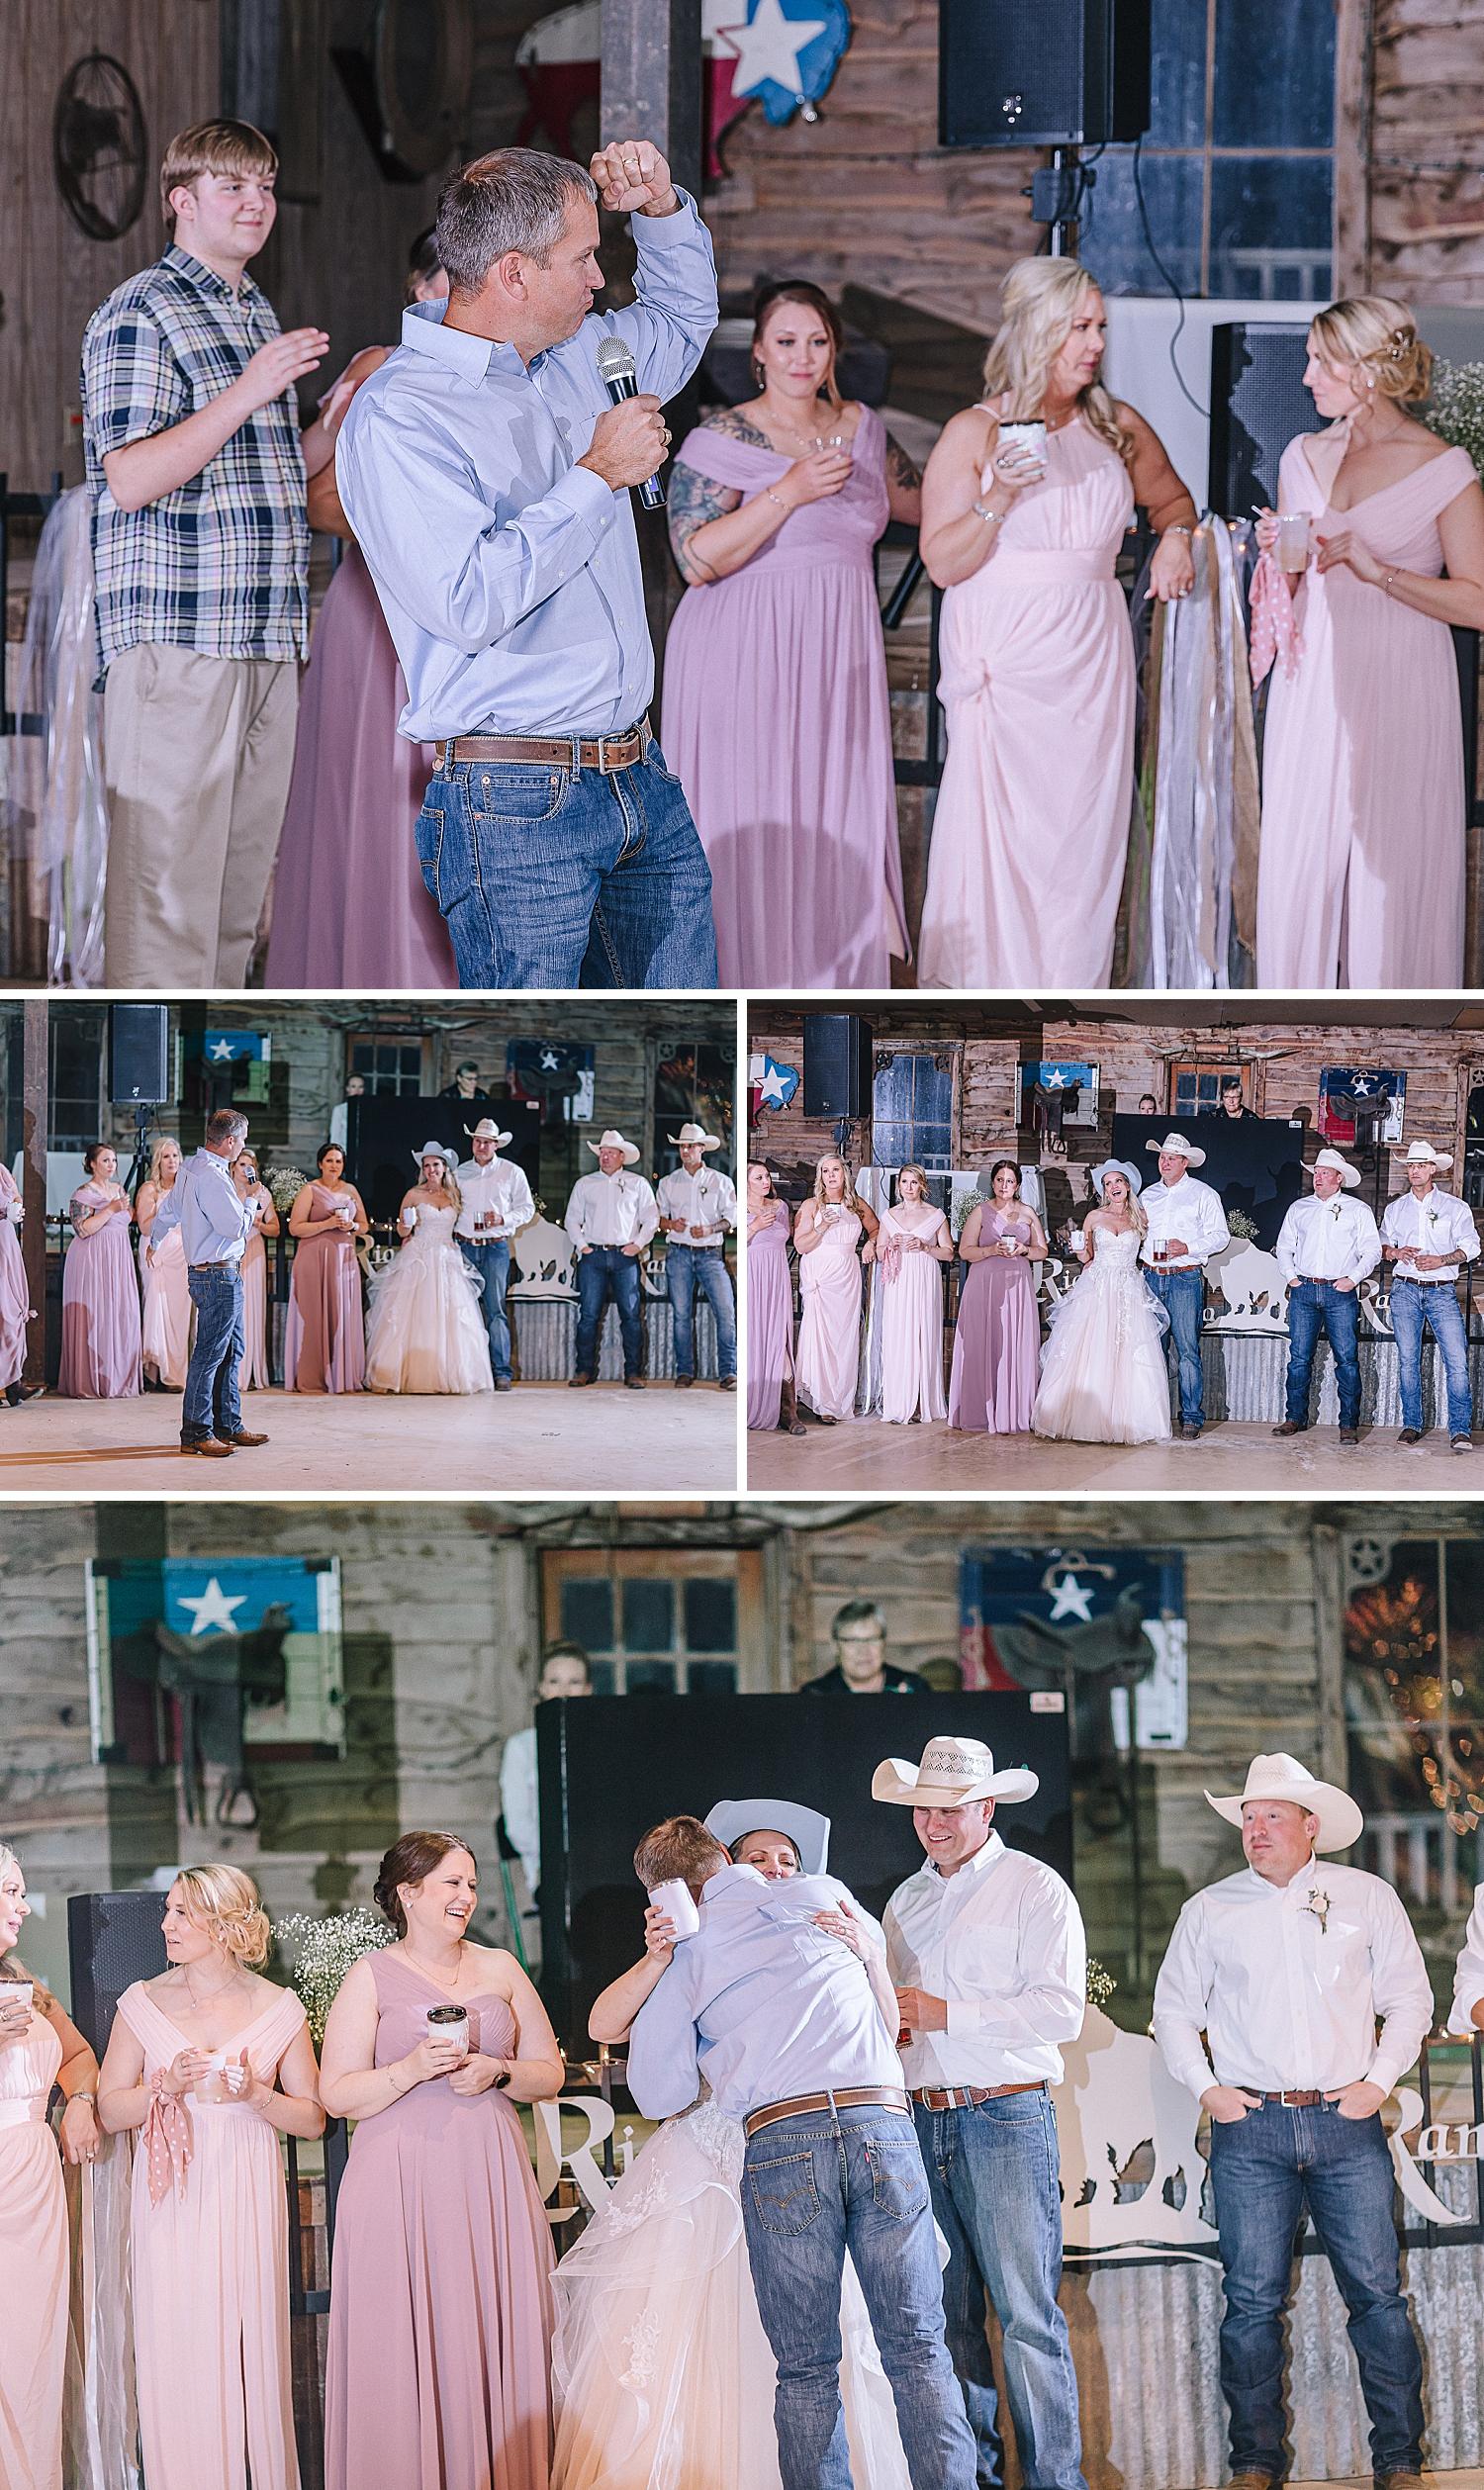 Rio-Cibilo-Ranch-Marion-Texas-Wedding-Rustic-Blush-Rose-Quartz-Details-Carly-Barton-Photography_0112.jpg